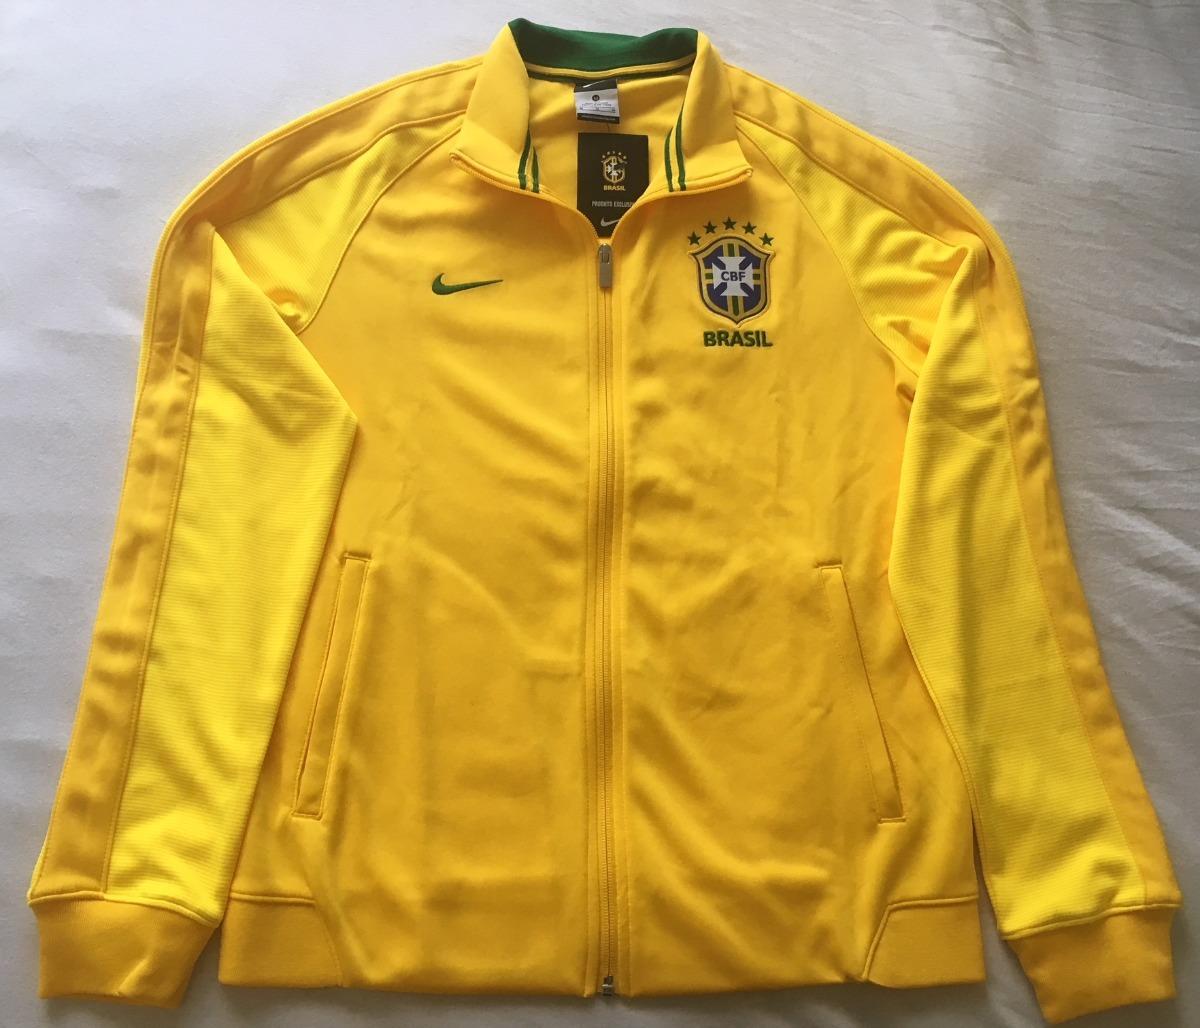 85113434cd82a jaqueta nike n98 brasil cbf 2016 2018. Carregando zoom.